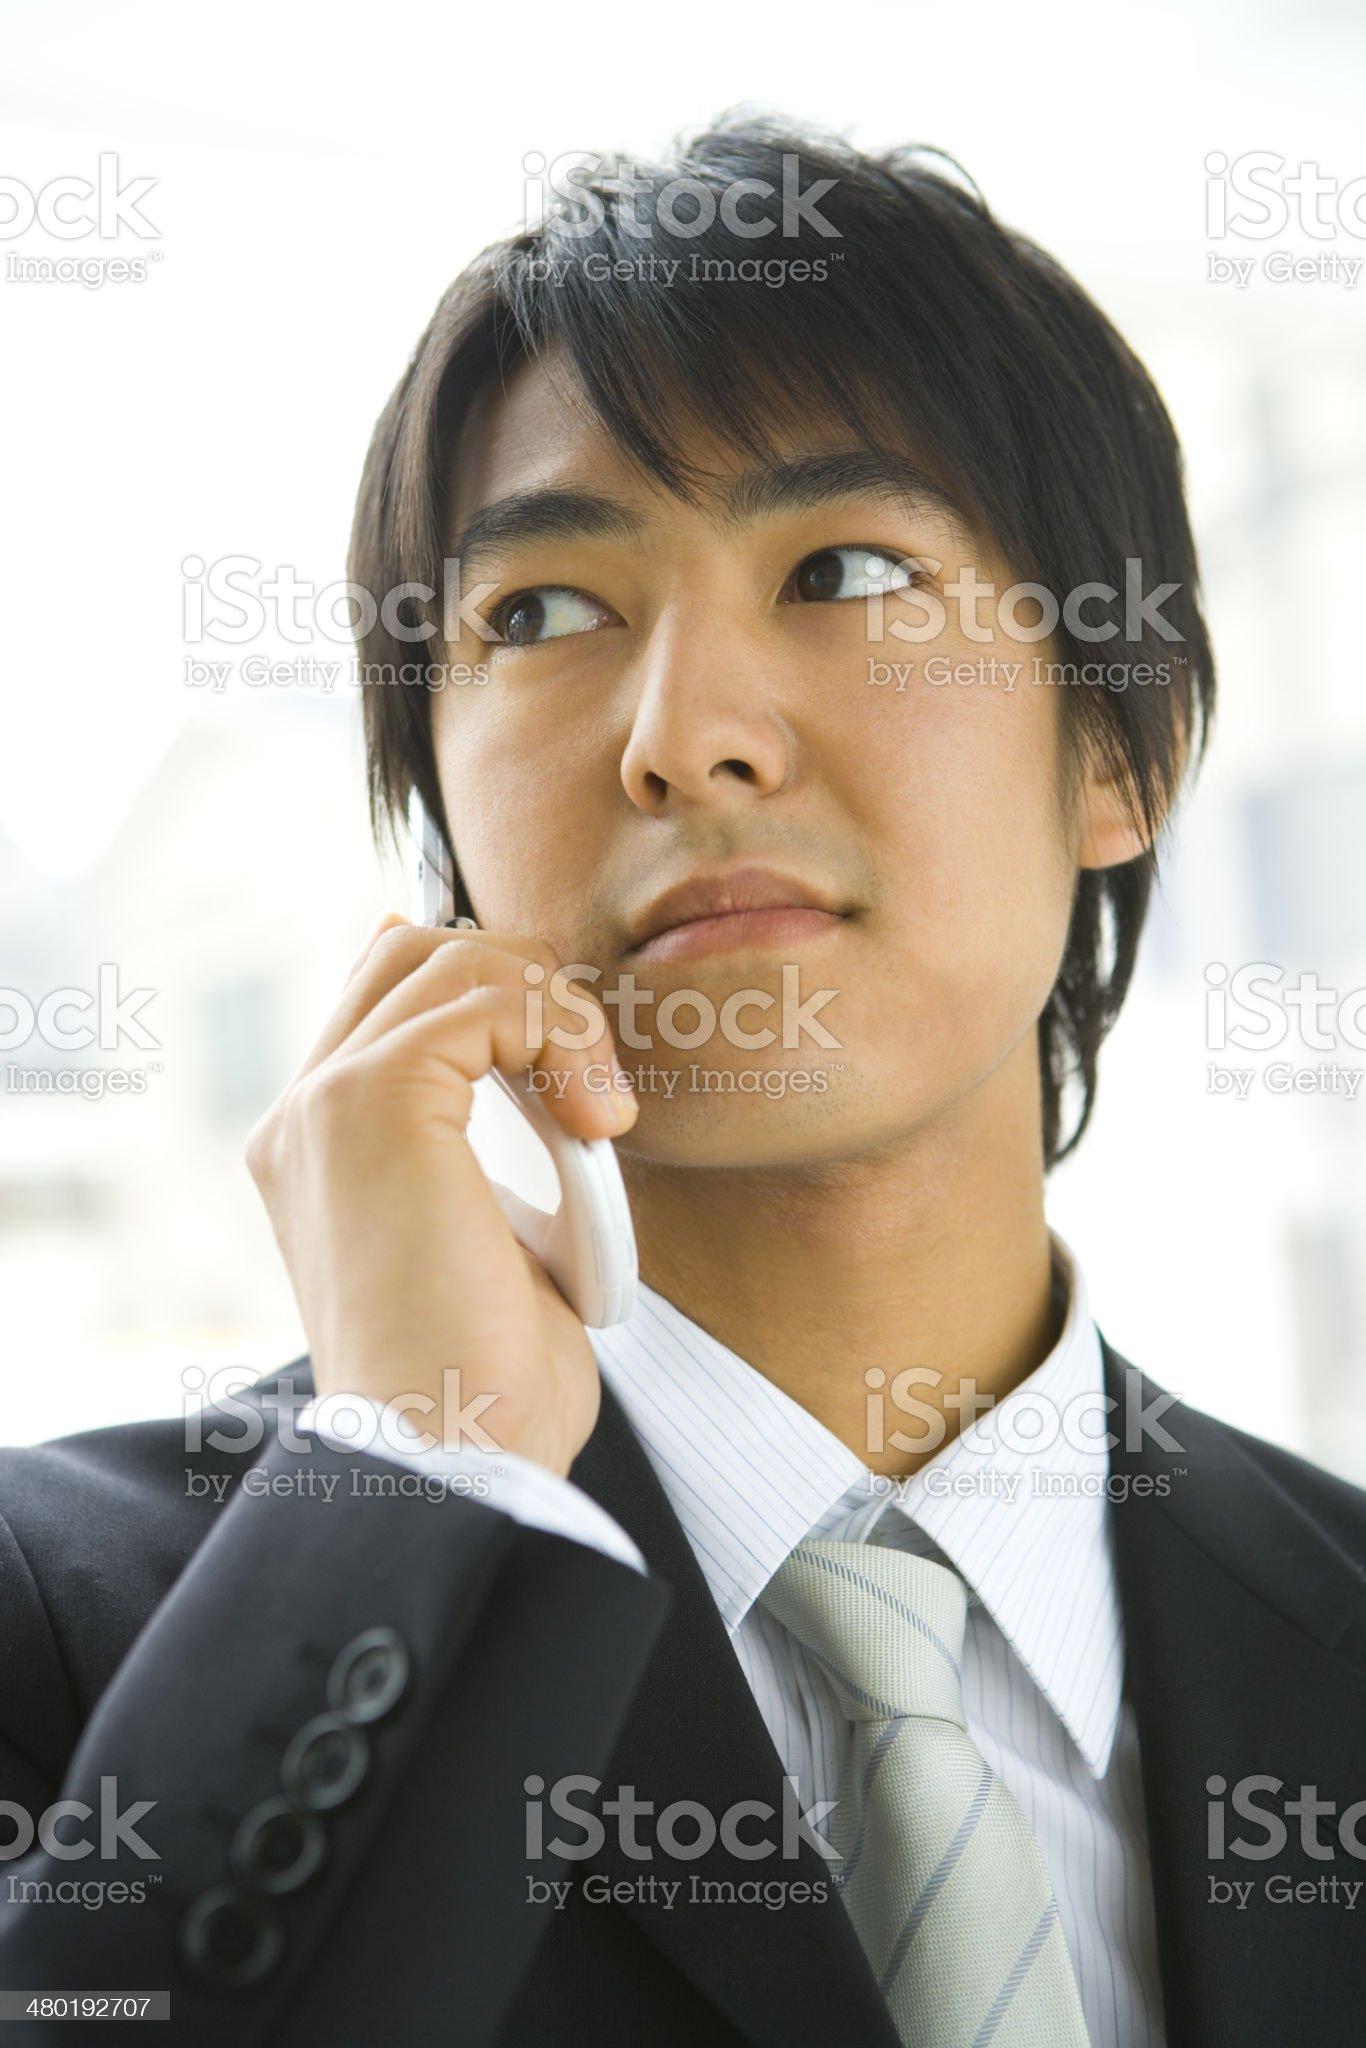 Man making a phone call royalty-free stock photo